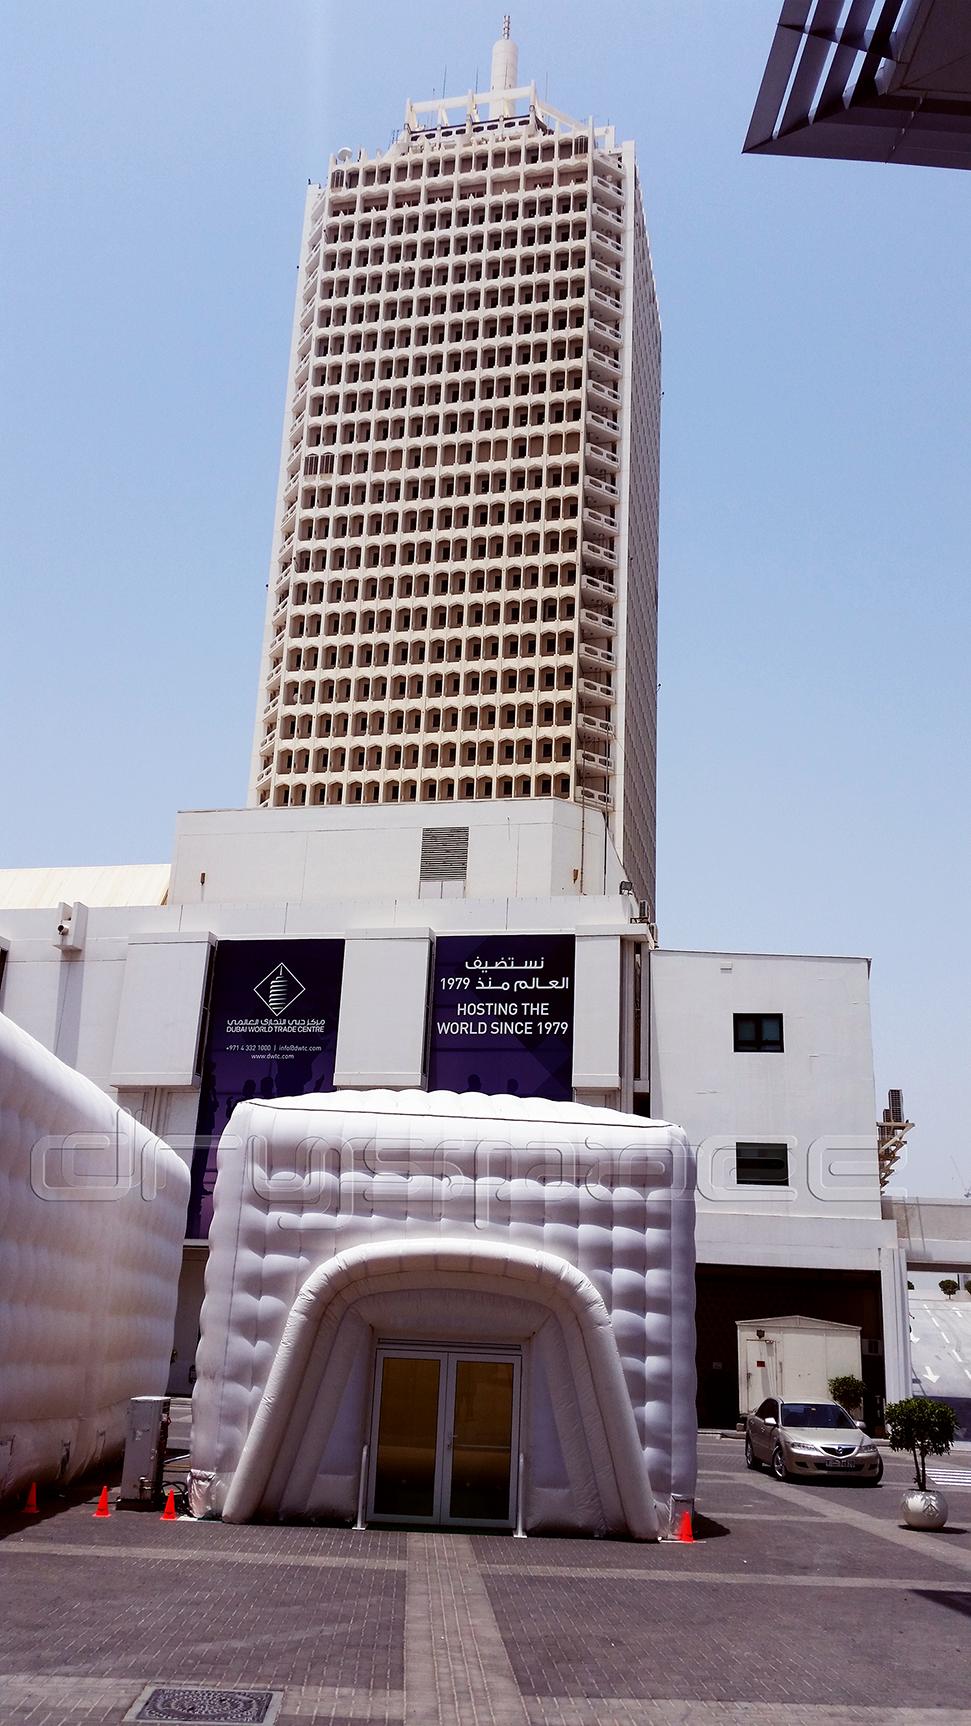 #DWTC Show Case #Dubai #DubaiWorldTradeCentre engage@dryspace.ae  www.dryspace.ae